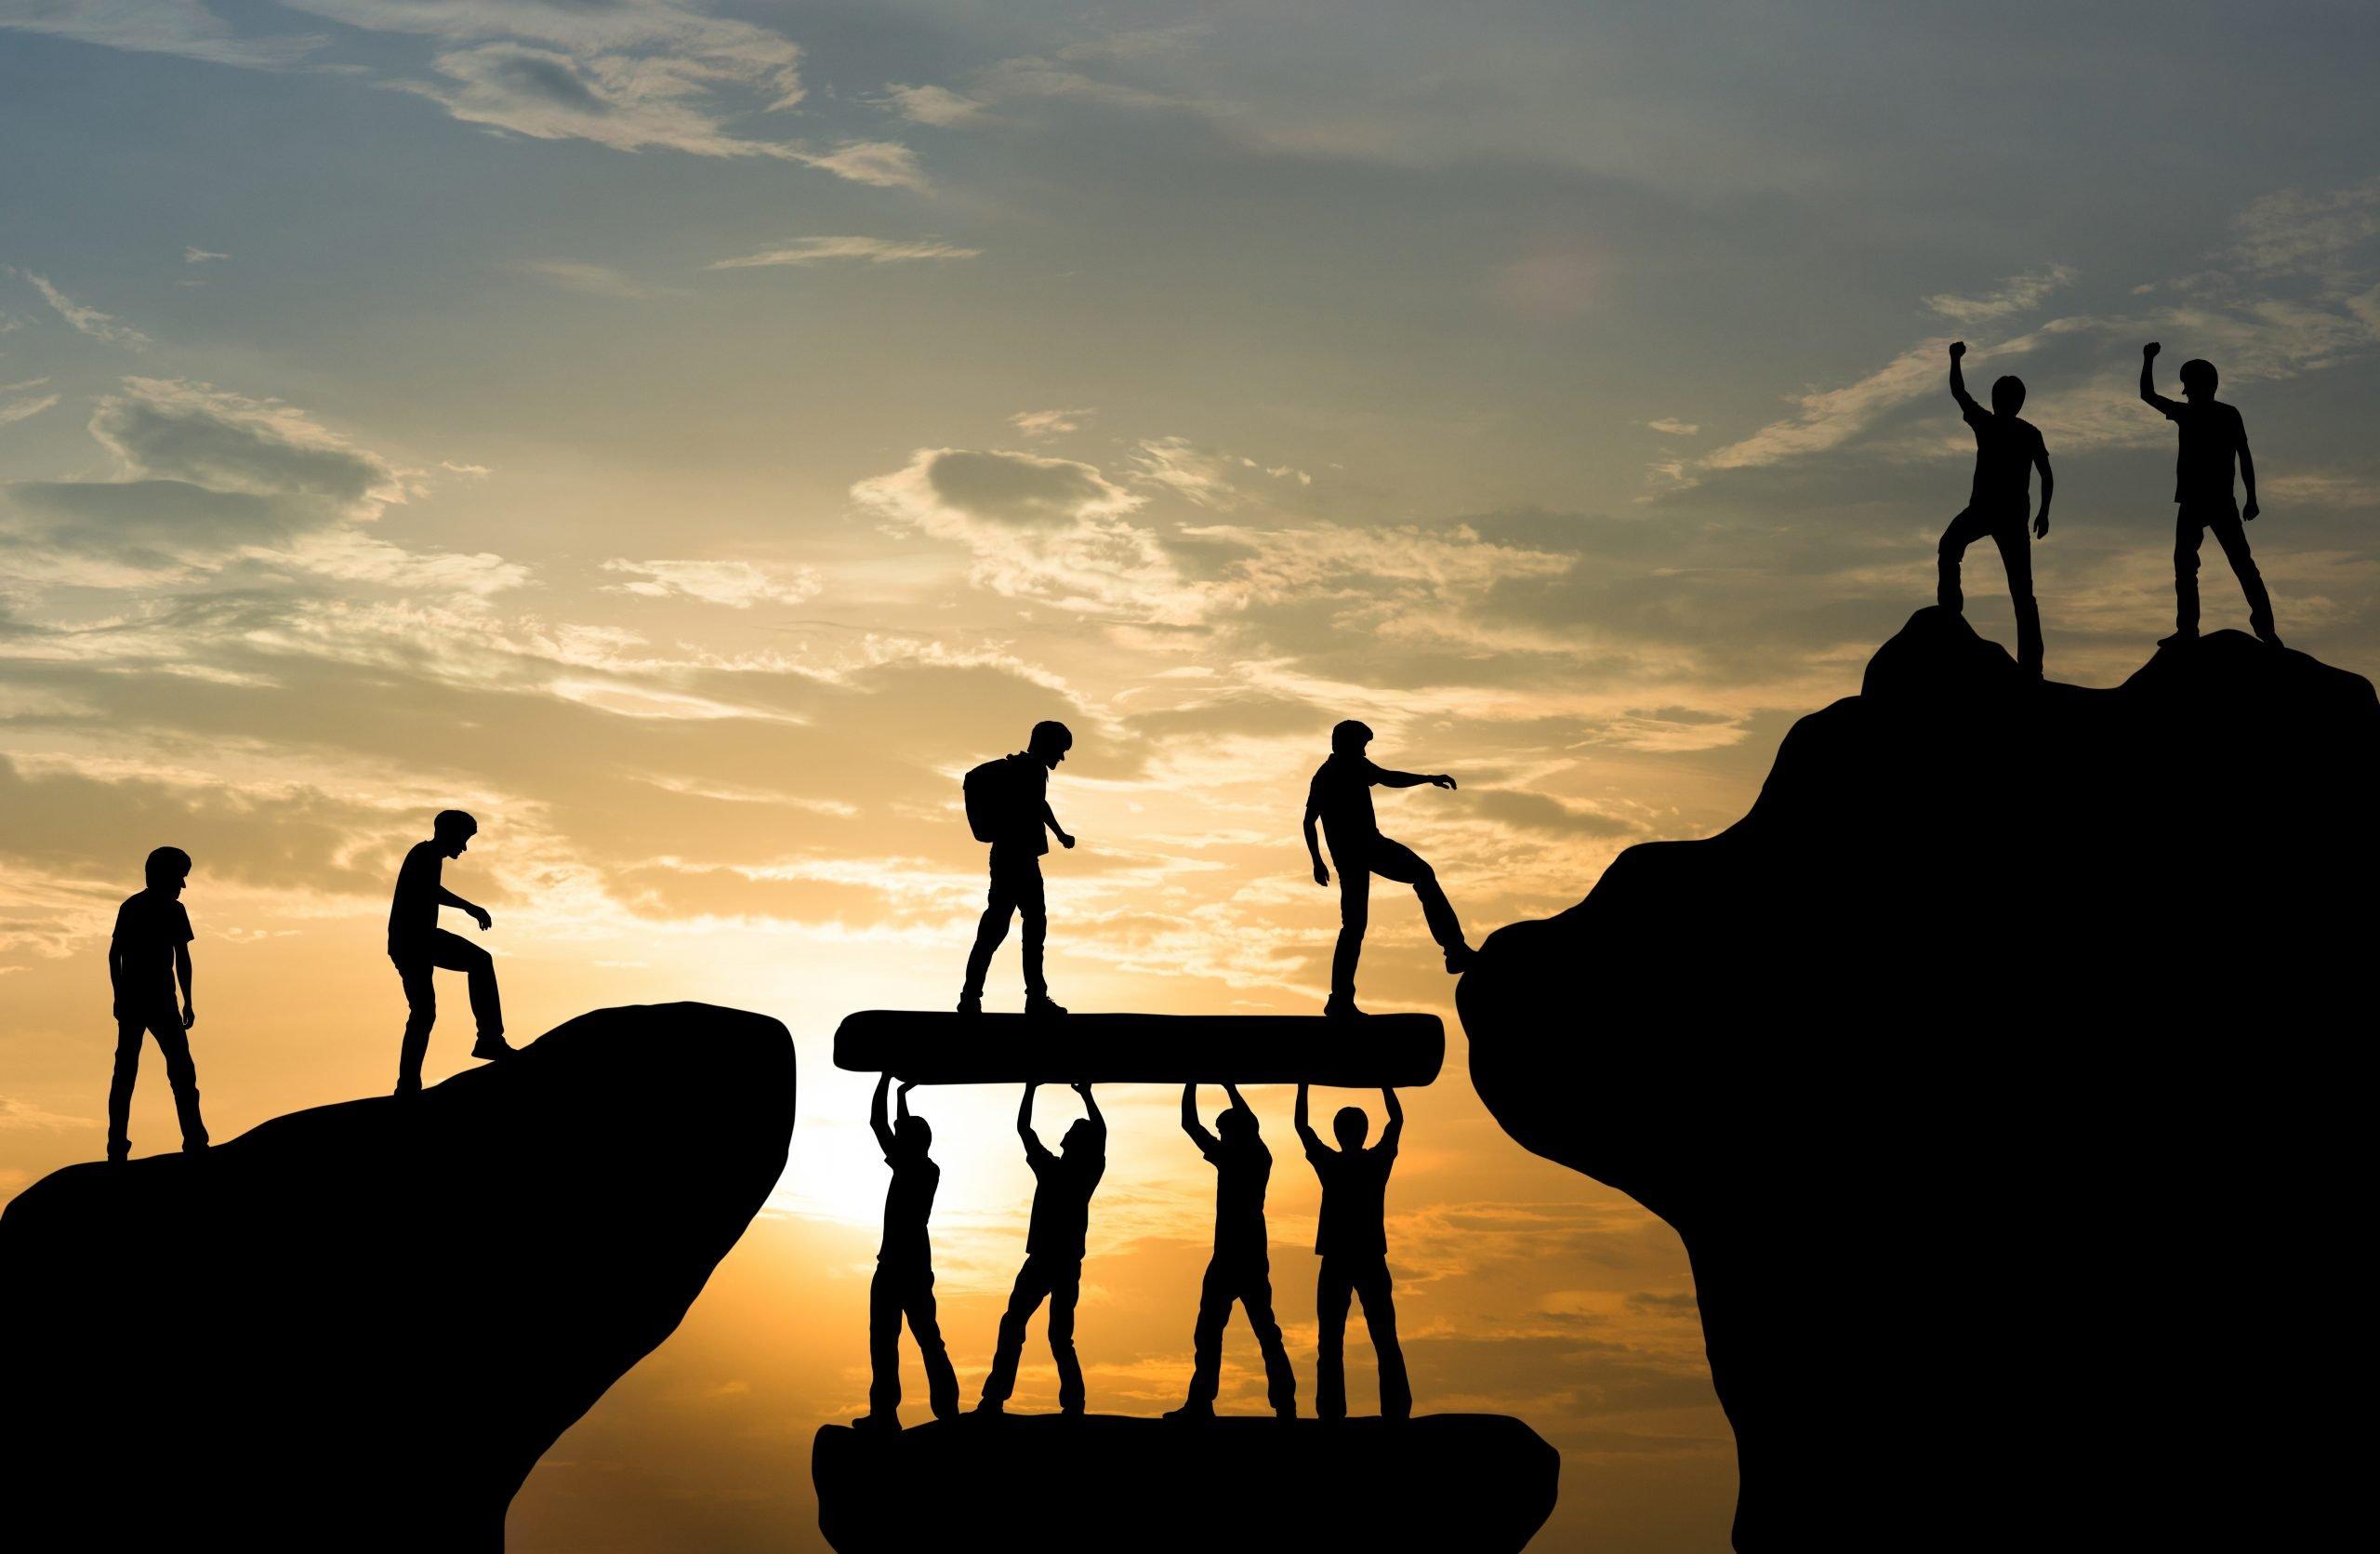 Group,Of,Team,People,Helping,Work,On,Peak,Mountain,Climbing